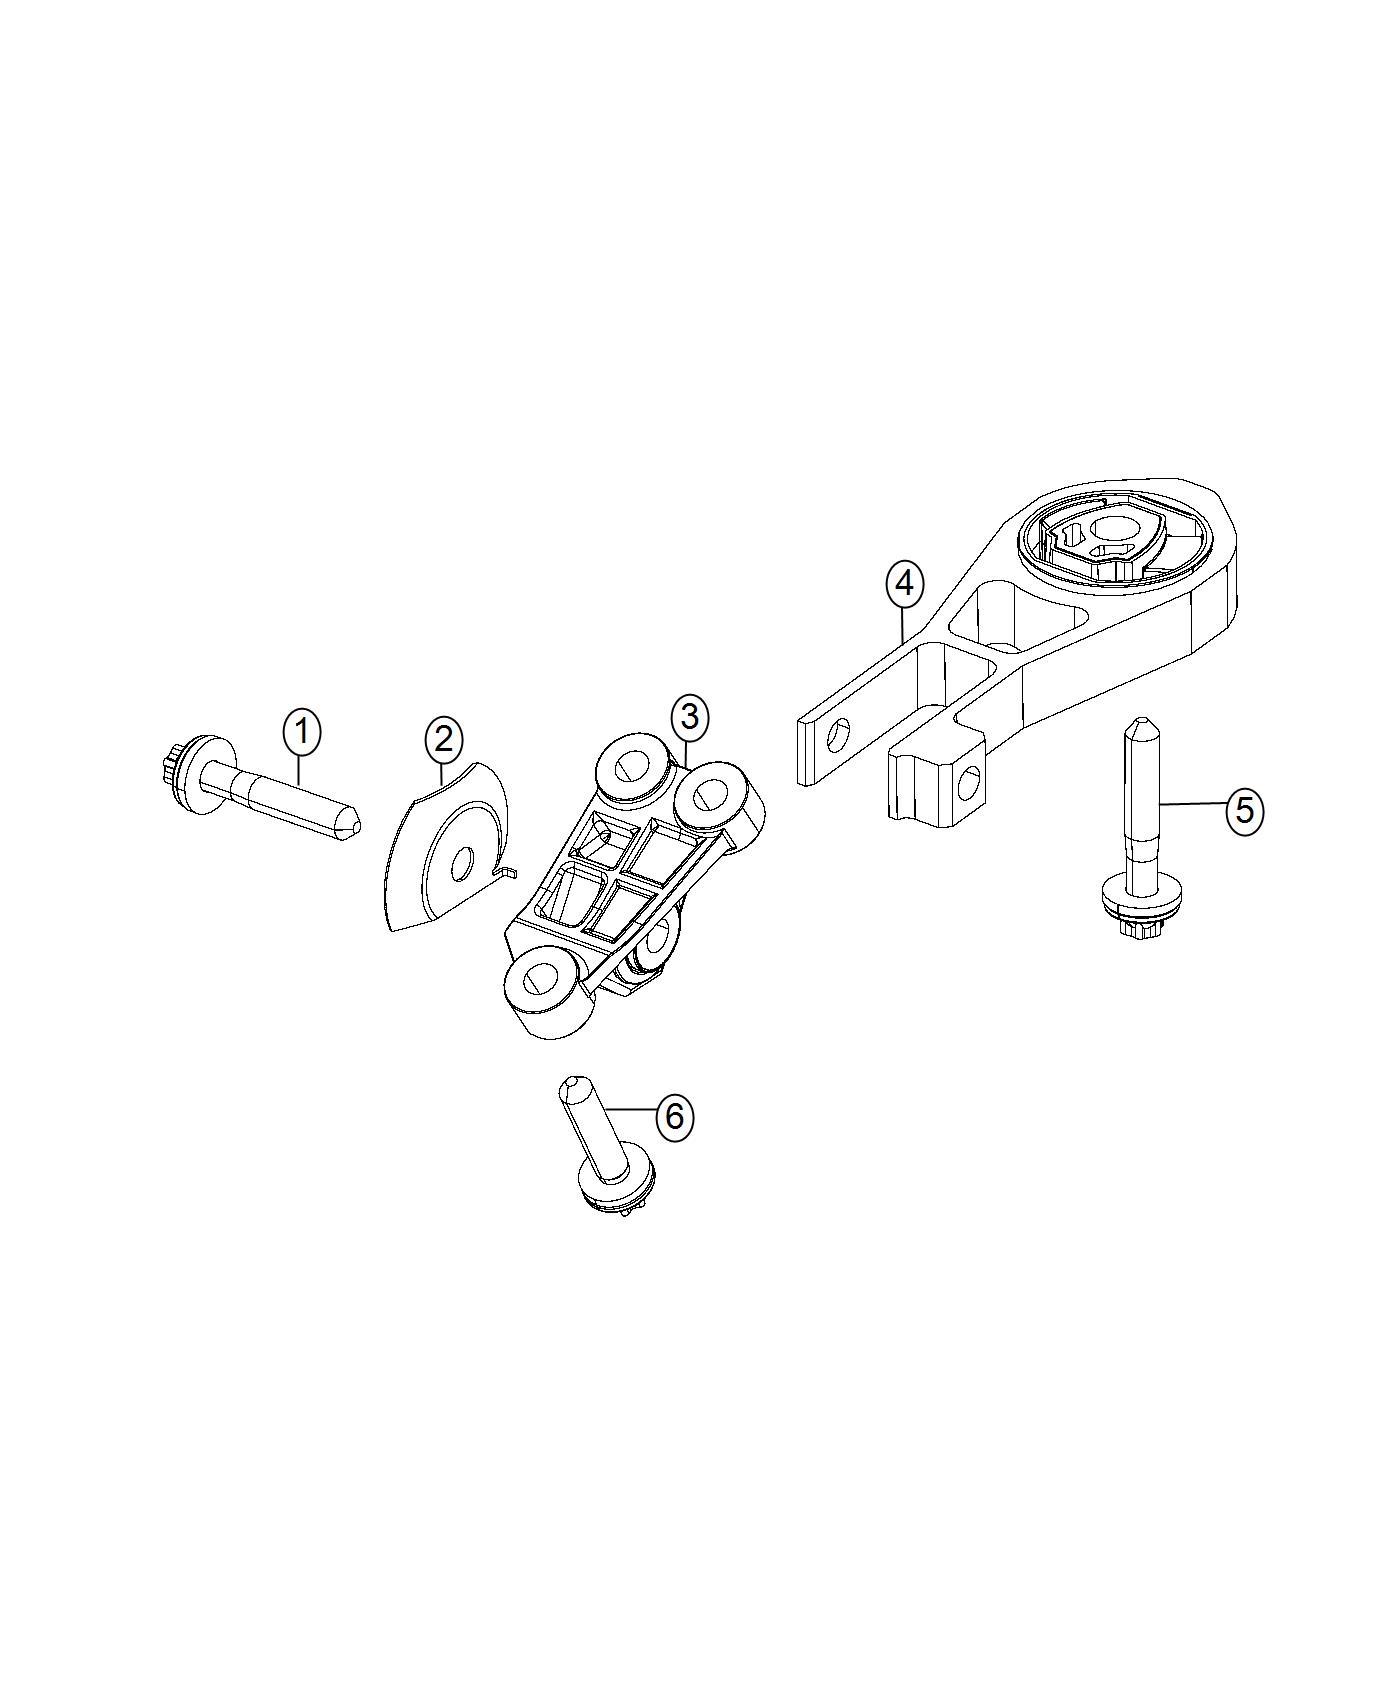 Jeep Renegade Engine Mount Isolator Rear Torque Strut Export Up To 5 6